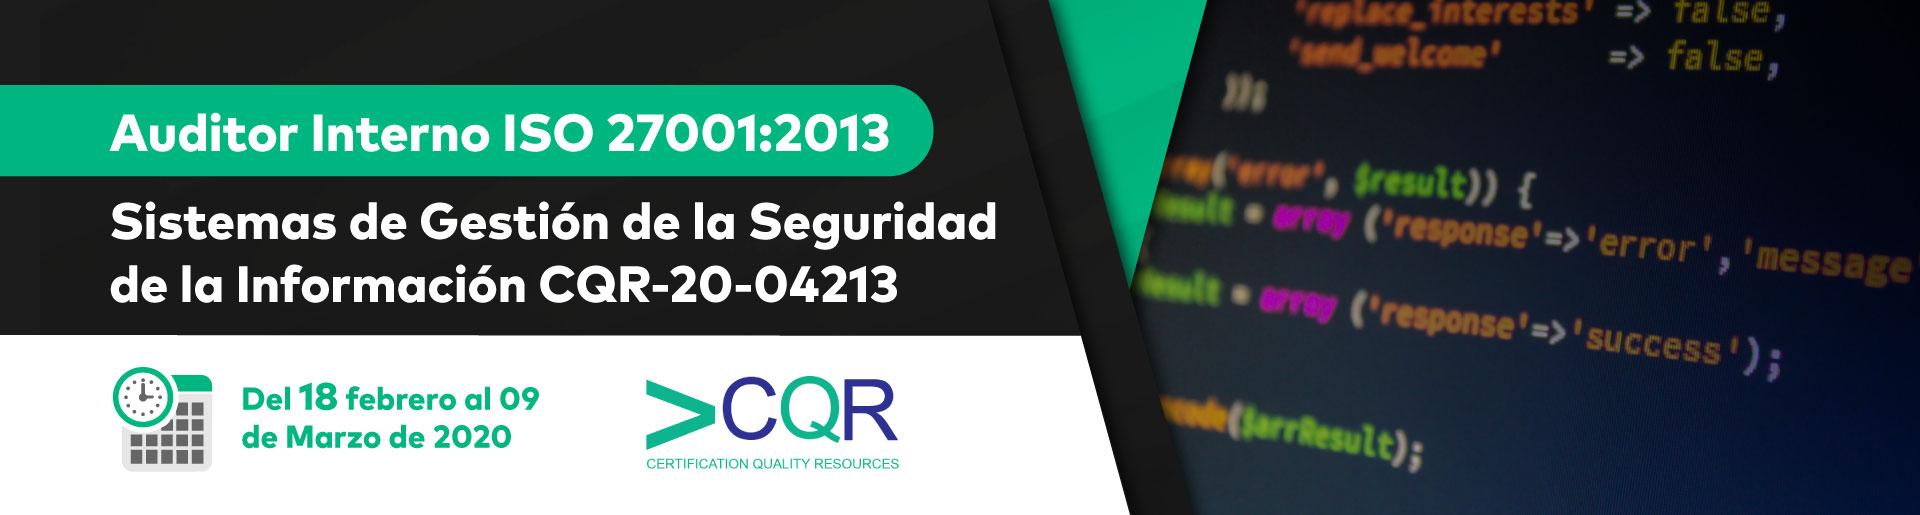 Curso Auditor Interno ISO 27001 CQR Cotecna